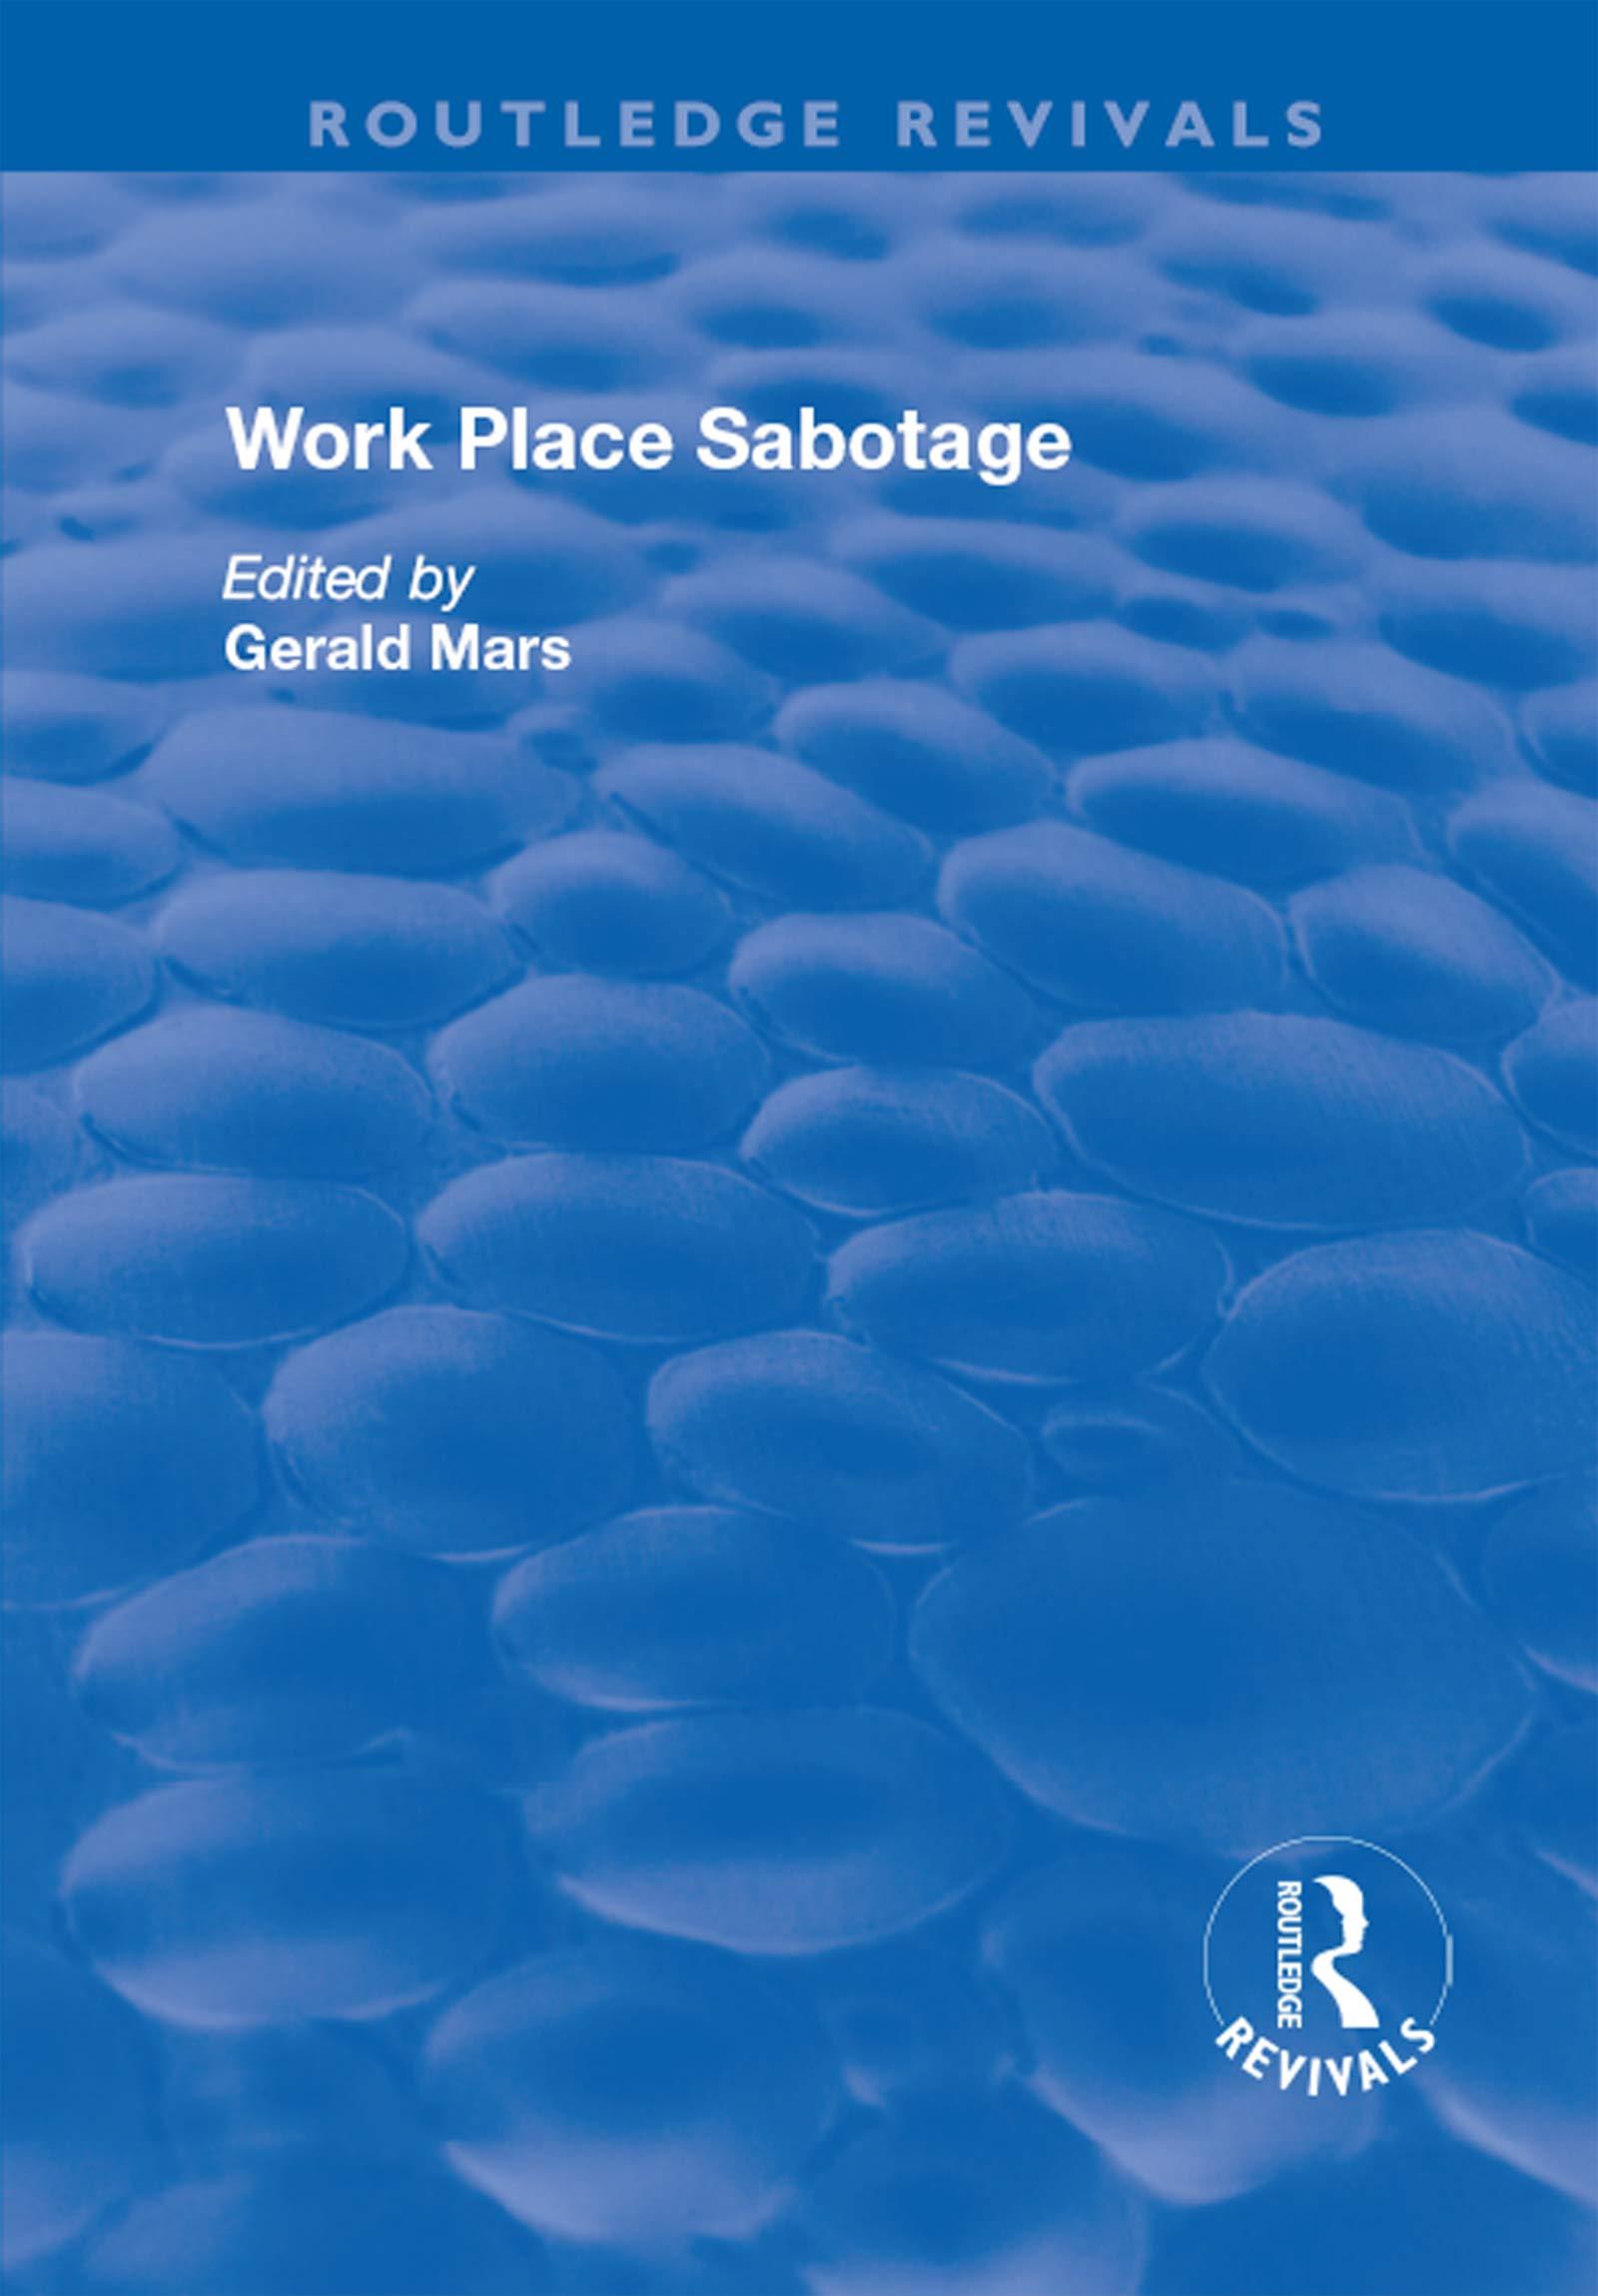 Work Place Sabotage (Routledge Revivals)